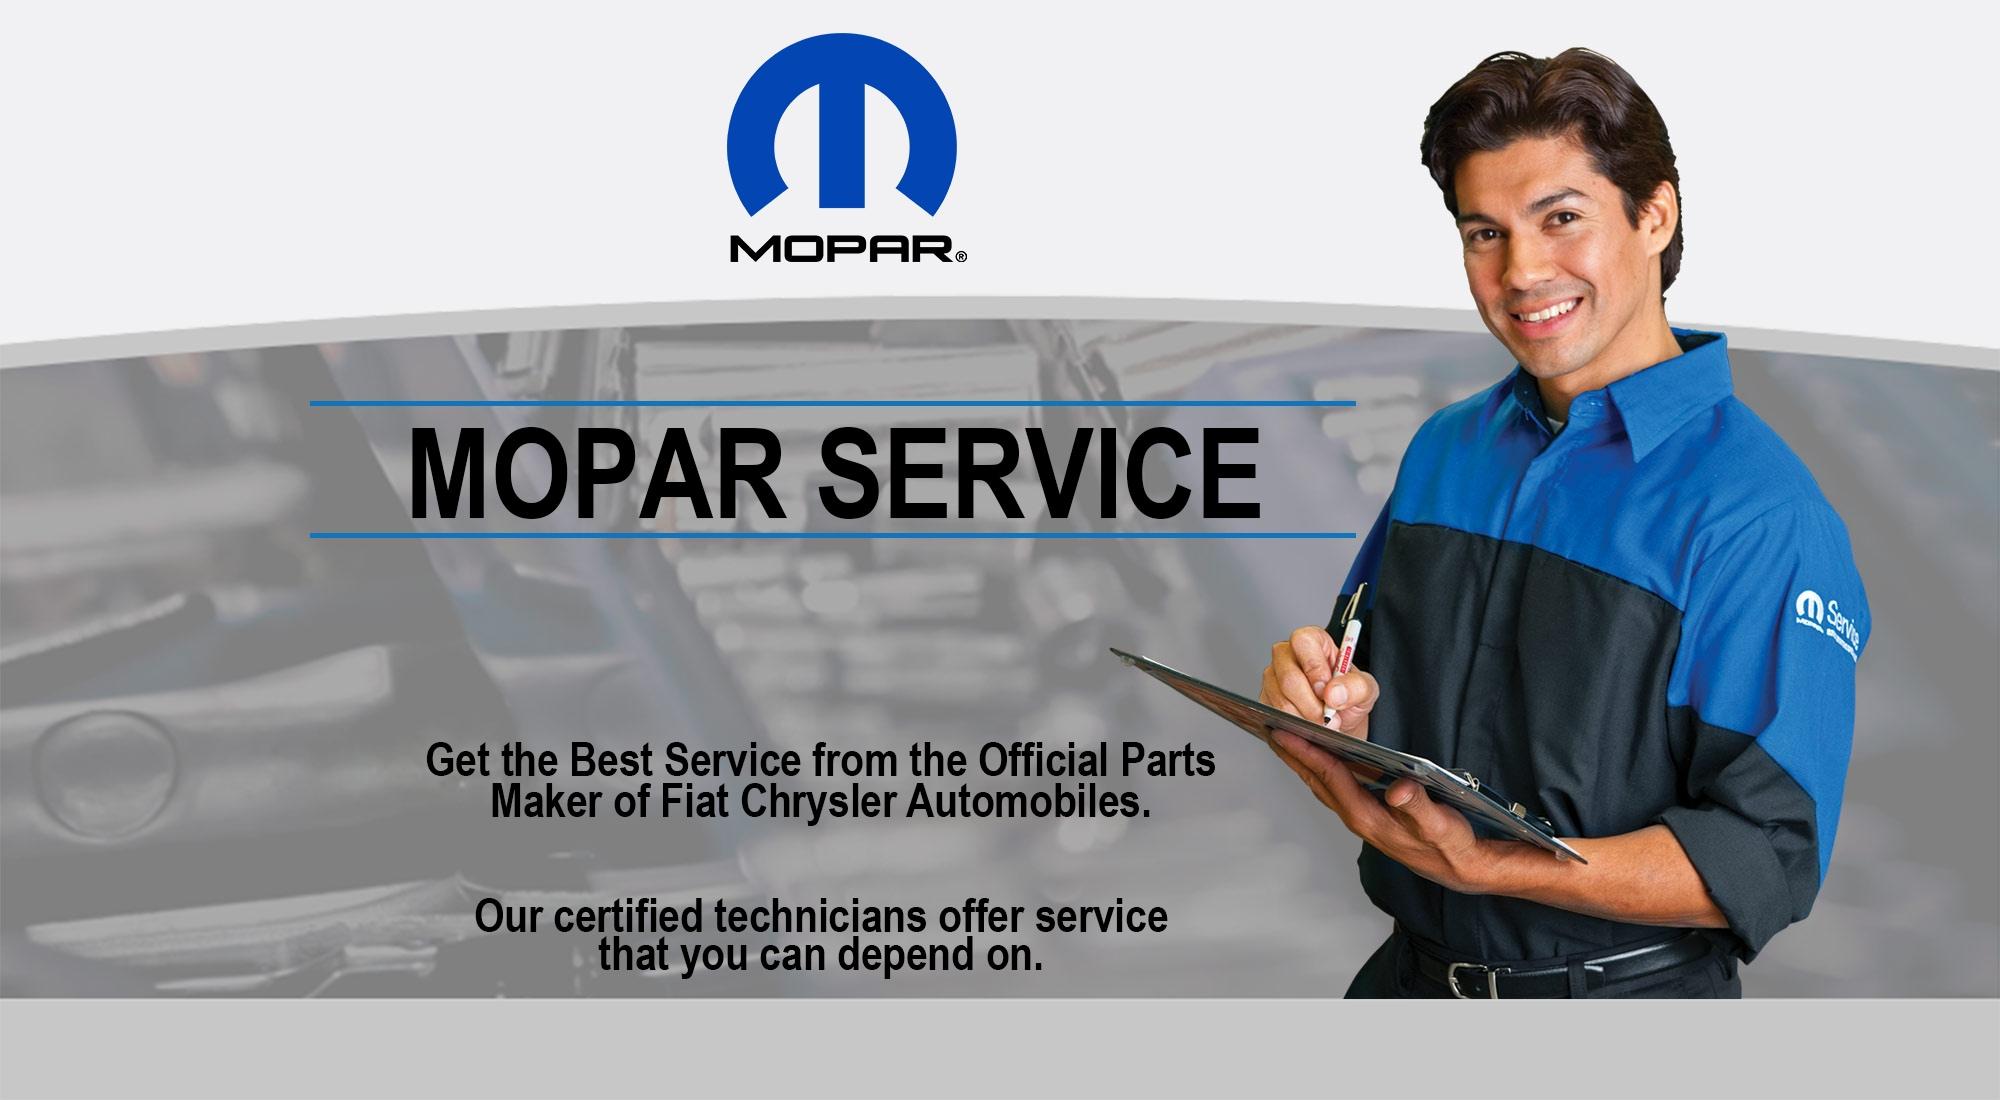 service that